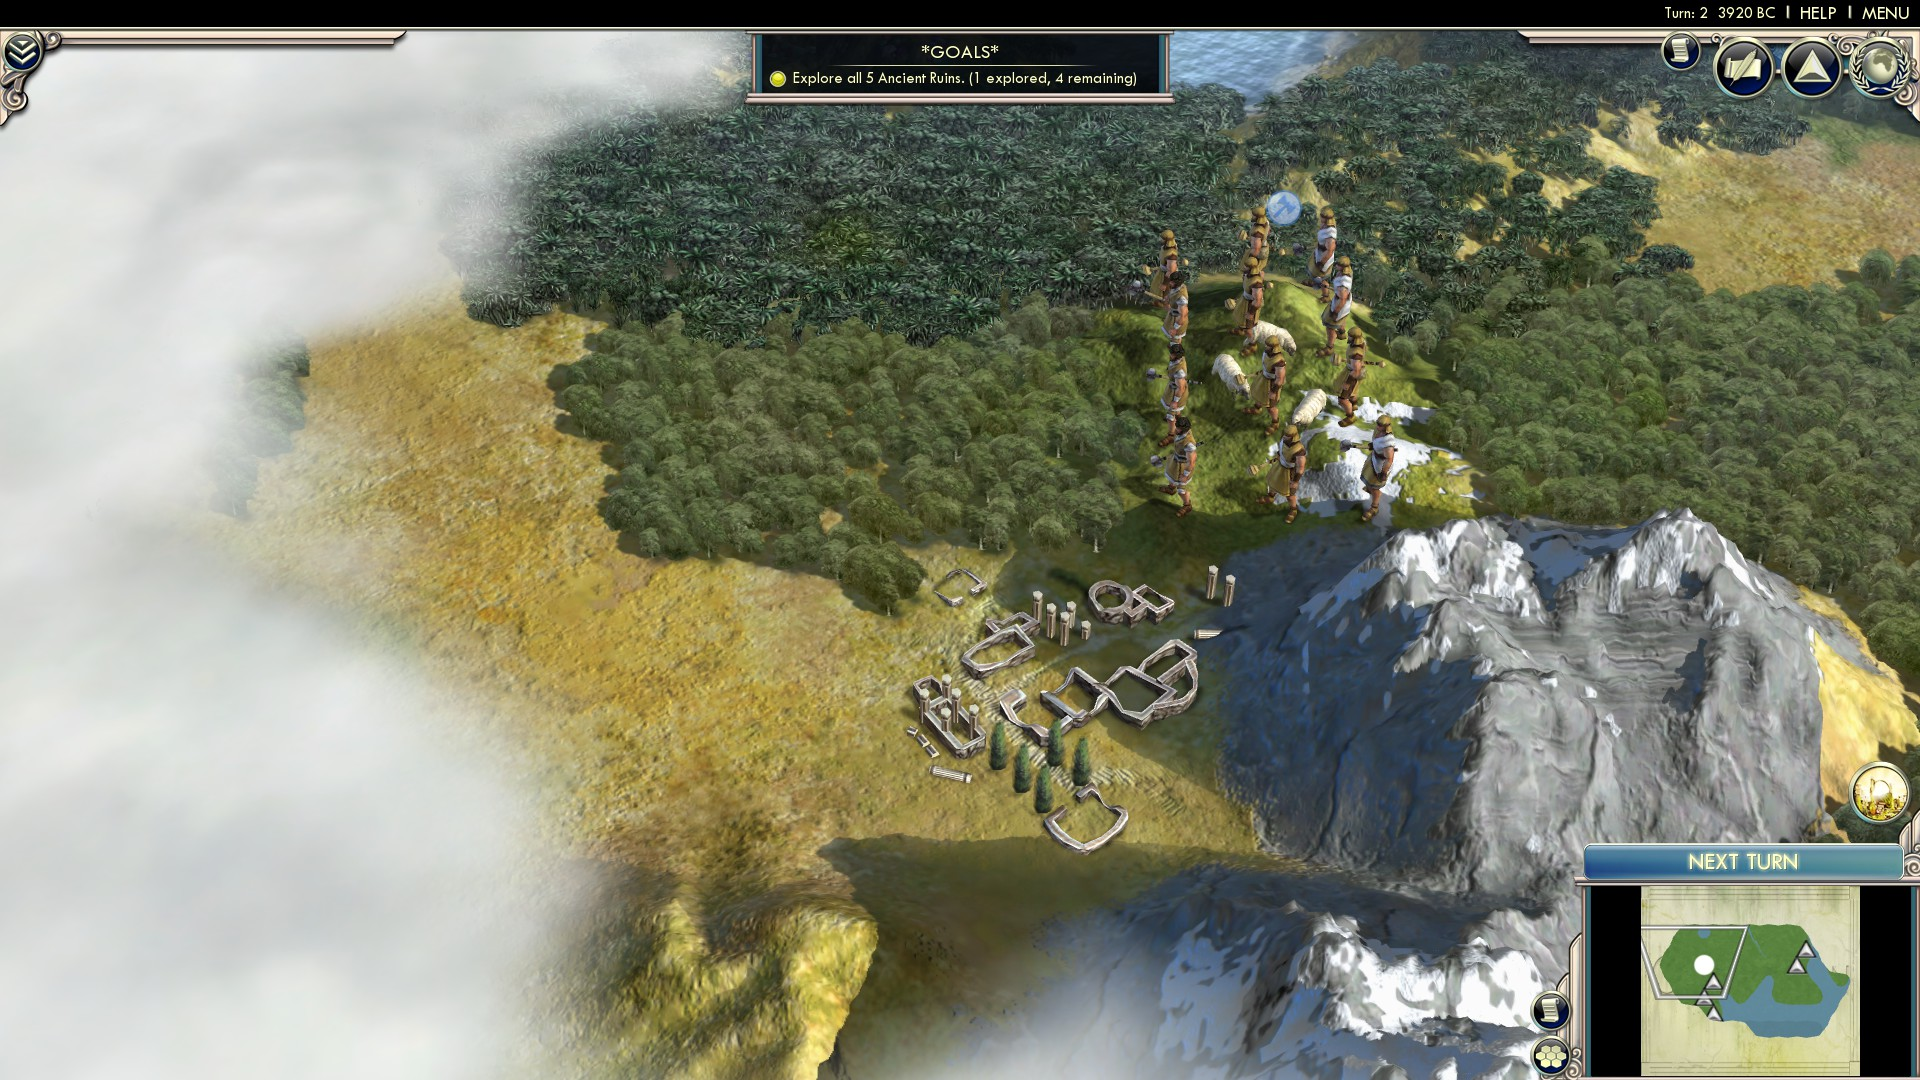 Civ 5 'Movement and Exploration' tutorial walkthrough